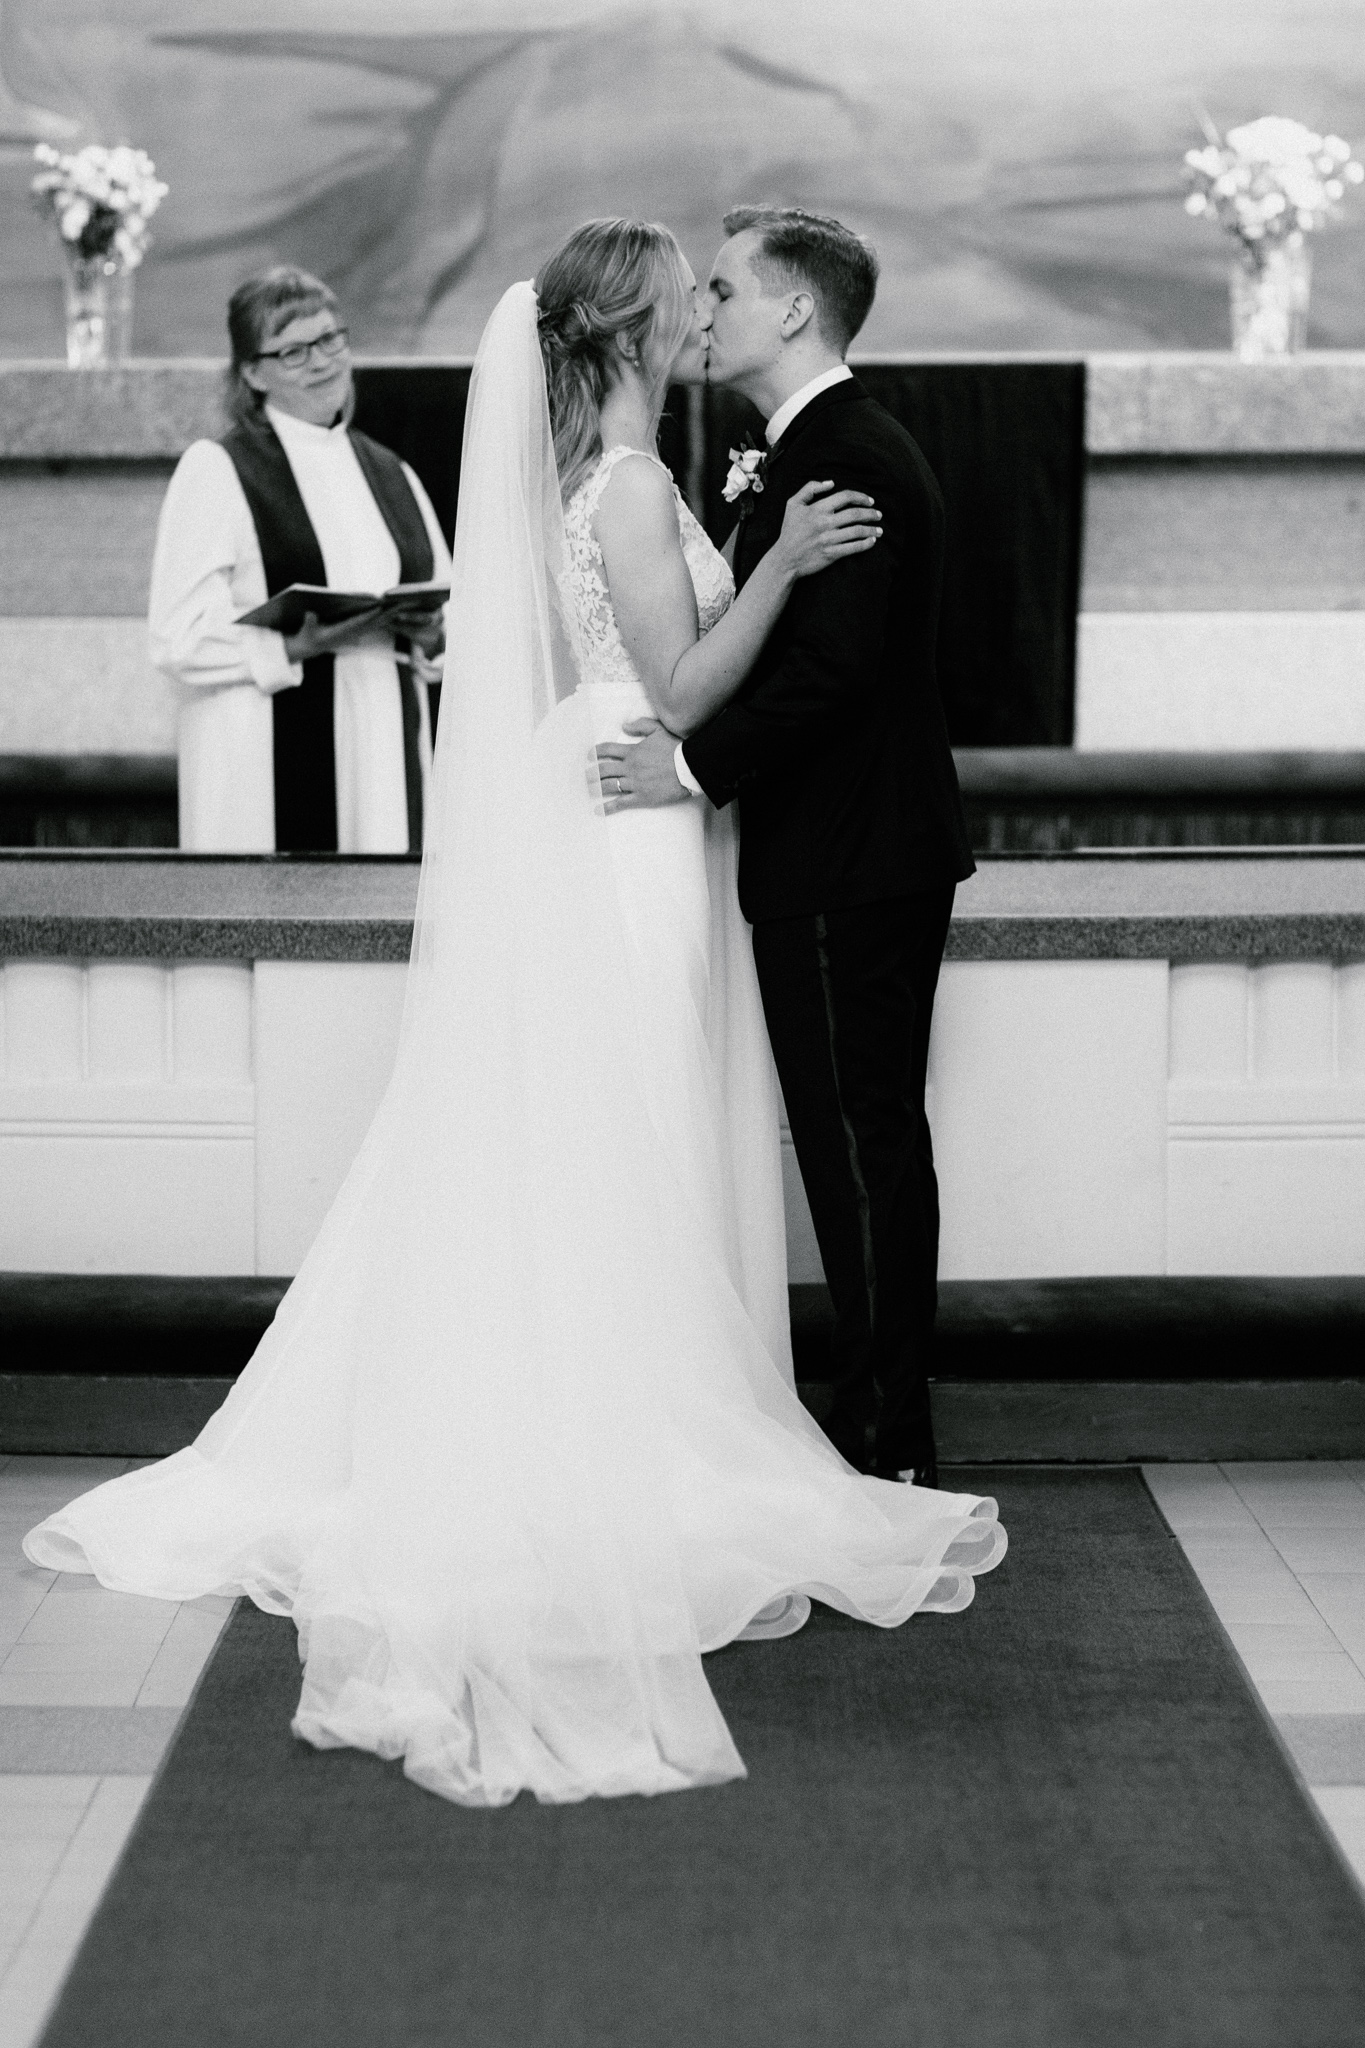 Johanna + Mikko - Tampere - Photo by Patrick Karkkolainen Wedding Photographer-71.jpg